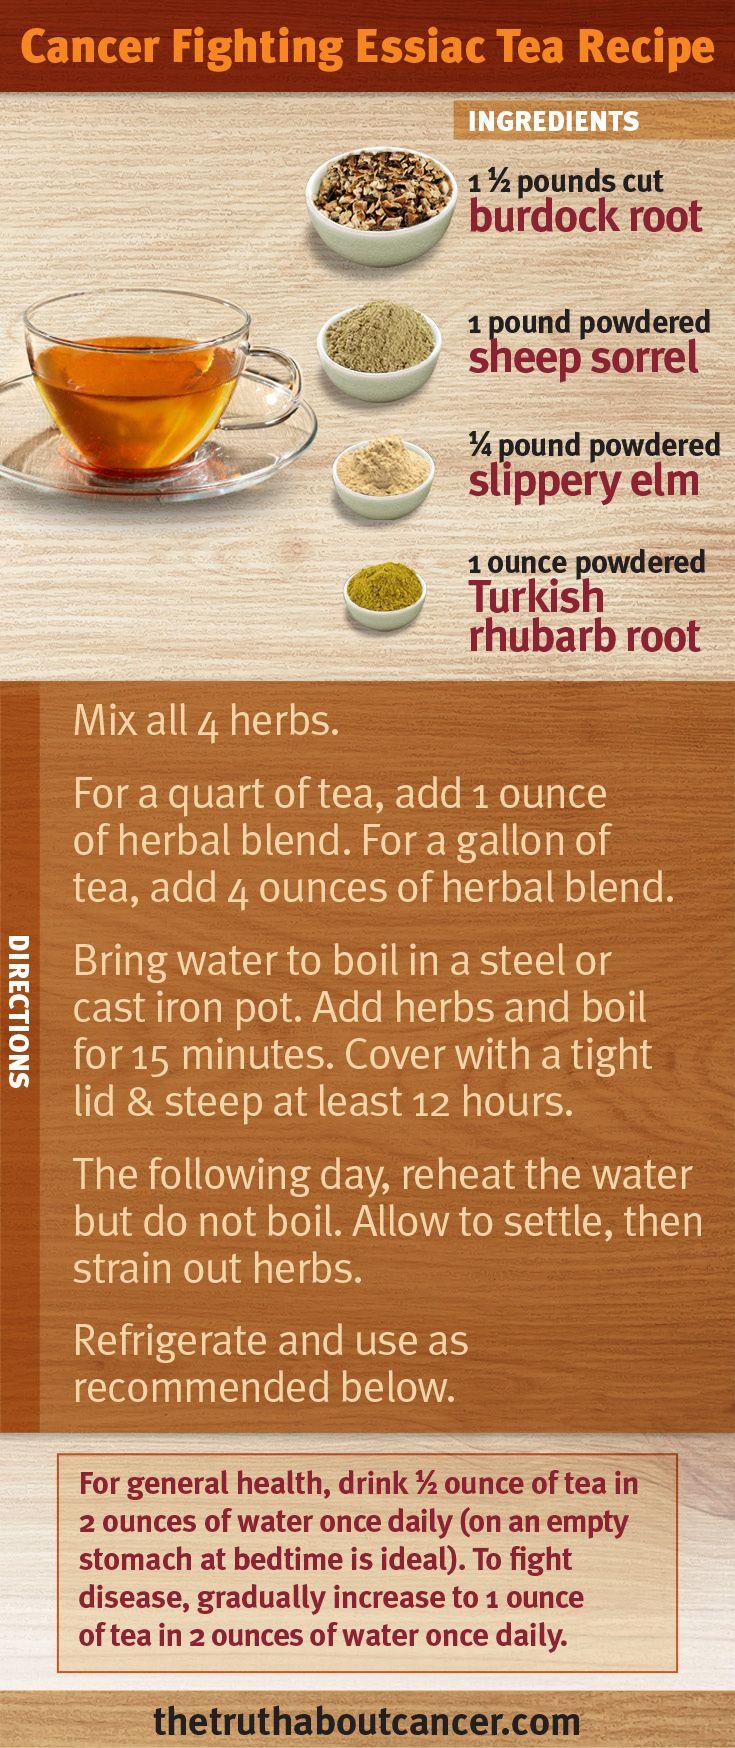 Cancer cure essiac herbal tea - Cancer Cure Essiac Herbal Tea 7